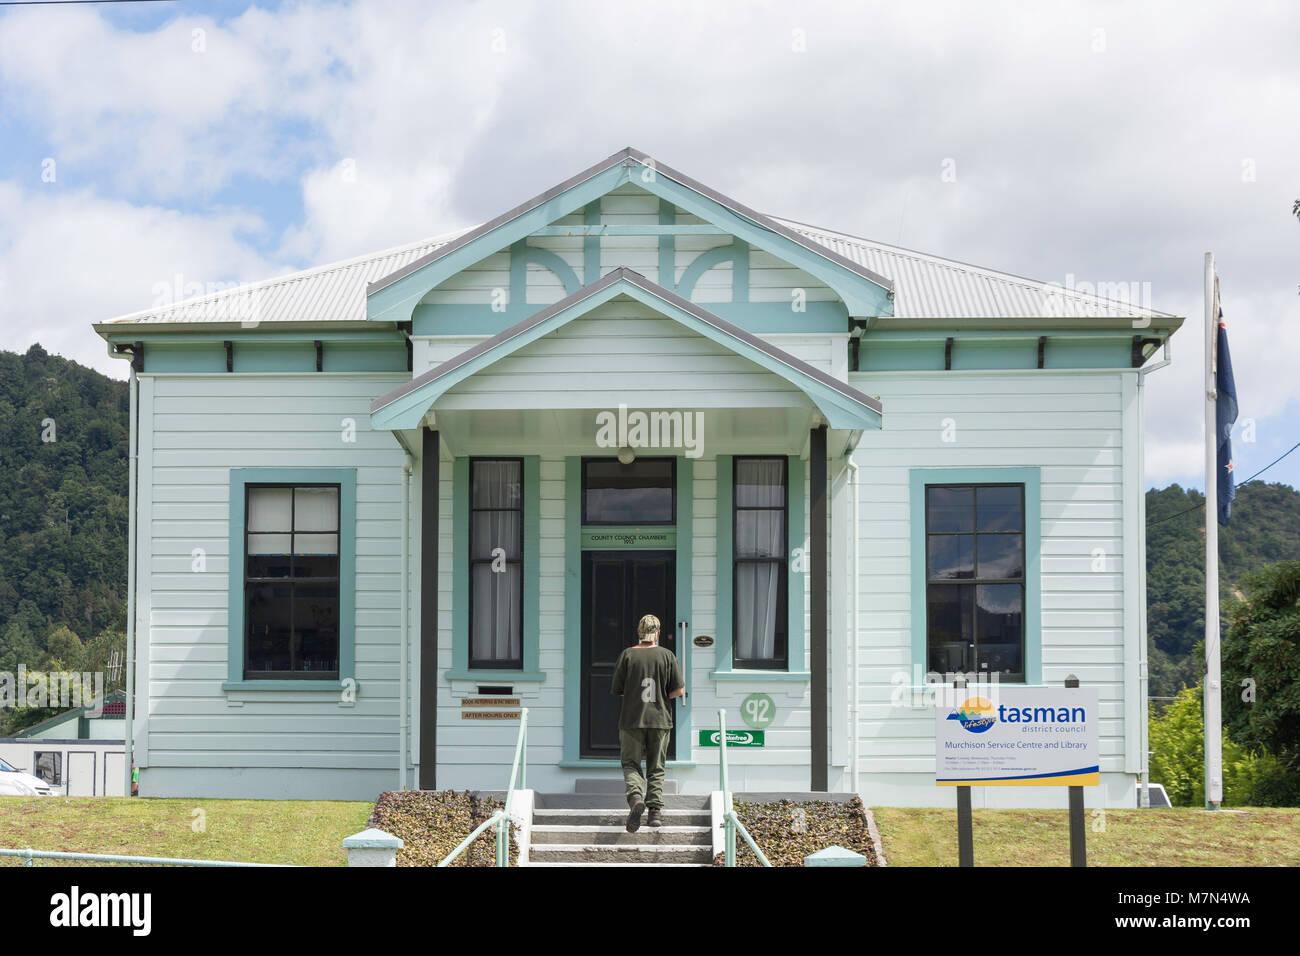 Tasman District Council, Murchison Service Centre and Library, Fairfax Street, Murchison, Tasman Region, New Zealand Stock Photo